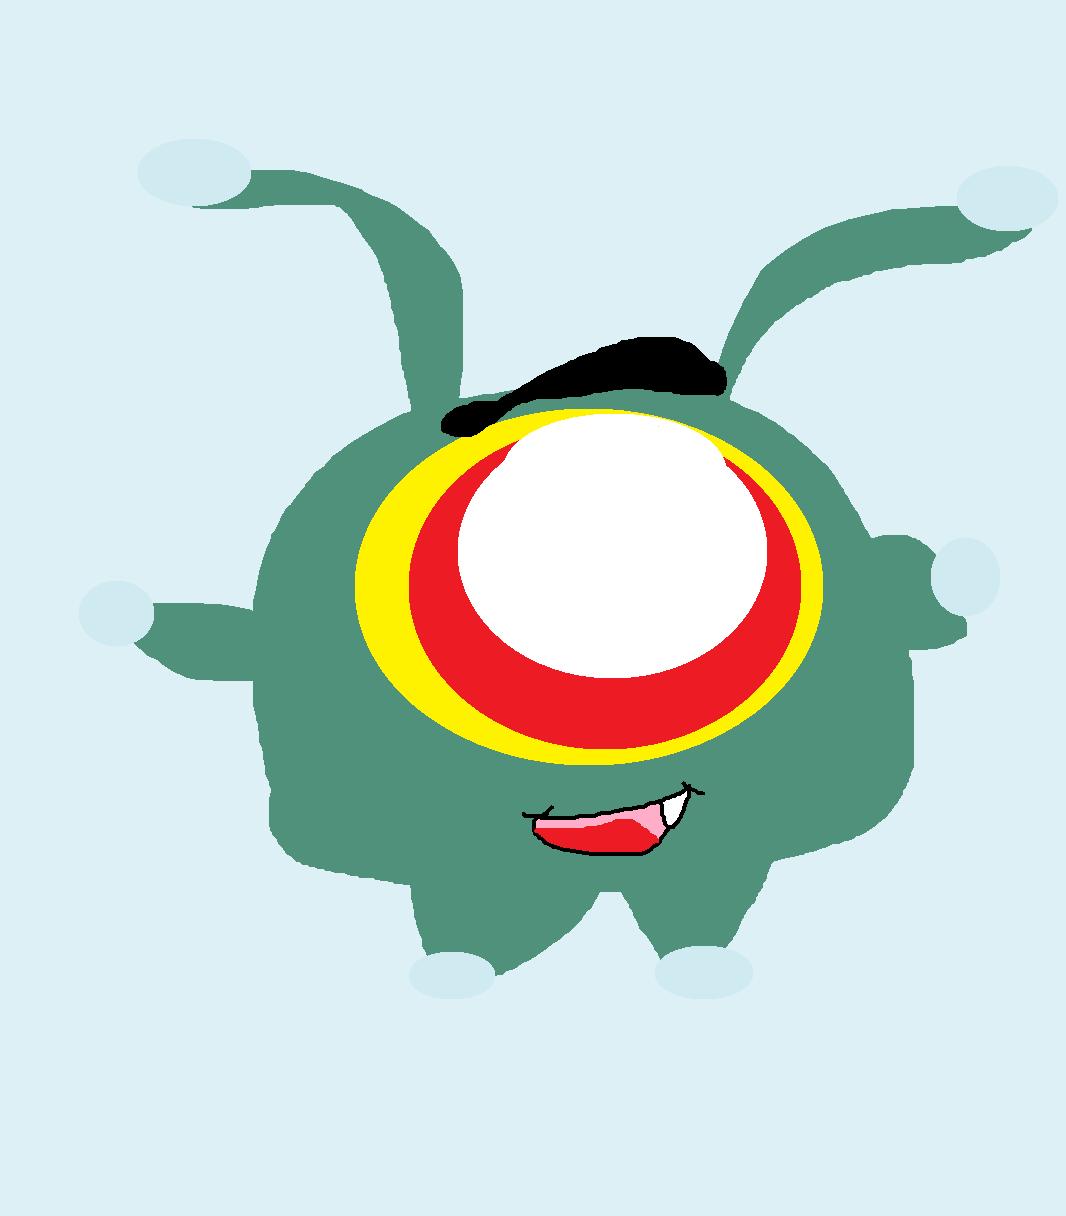 Plankton Chibi Cling Plush by Falconlobo